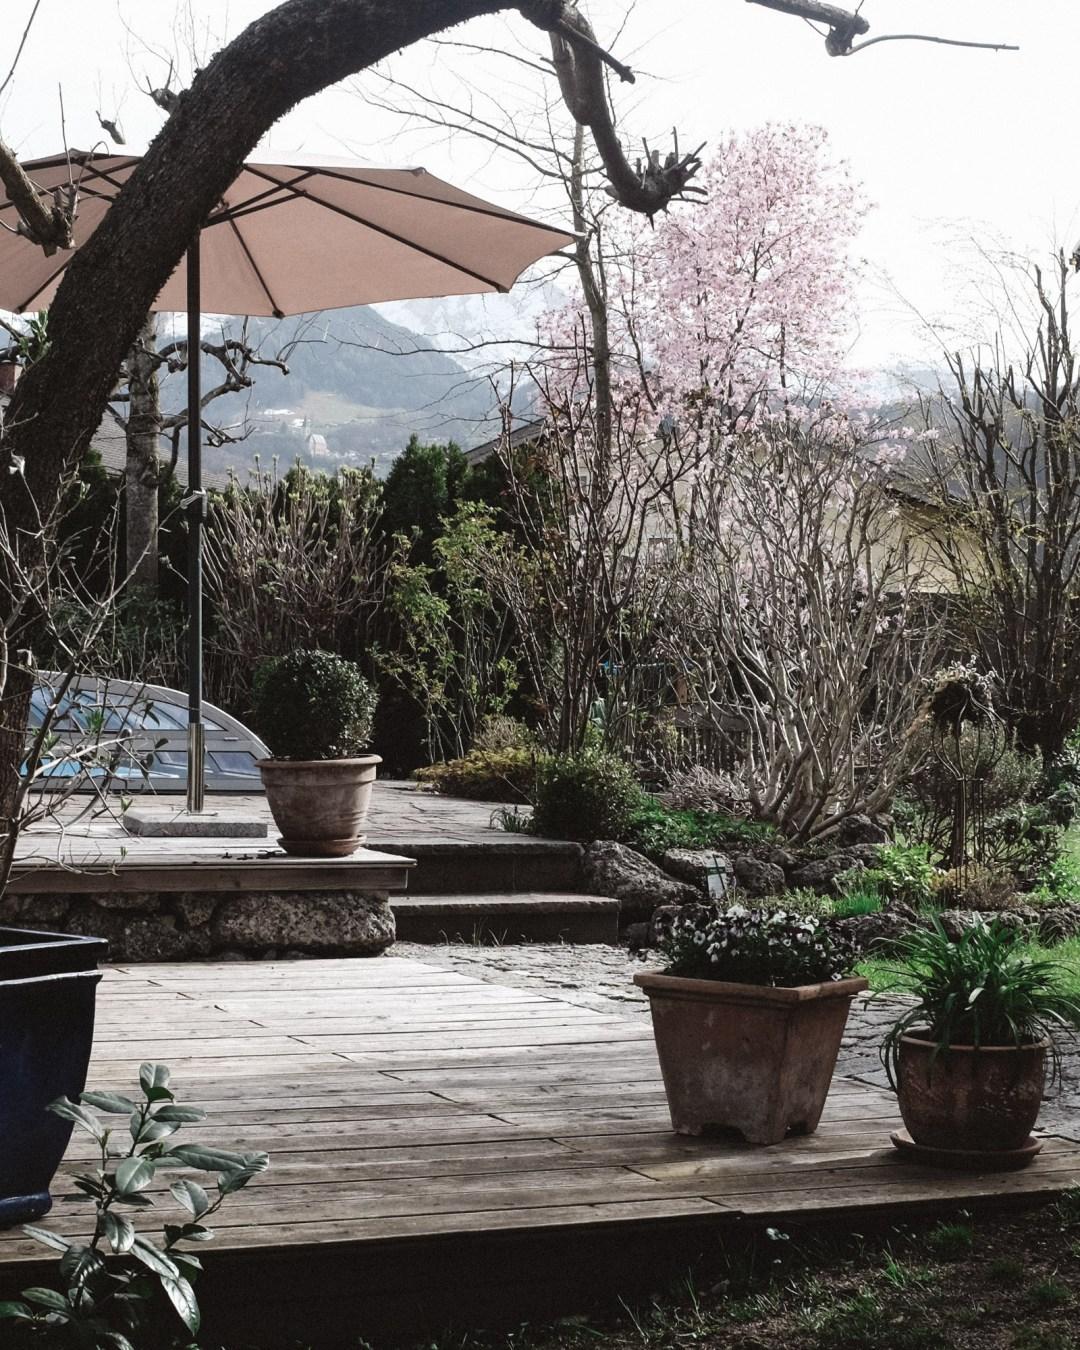 inastil, Frühlingsgarten, Teich, Magnolien, Frühlingsblüher, Lachs, Spargelrezept, Mangosalsa, Lowcarb, leichtes Abendessen, Ü50Blogger-2